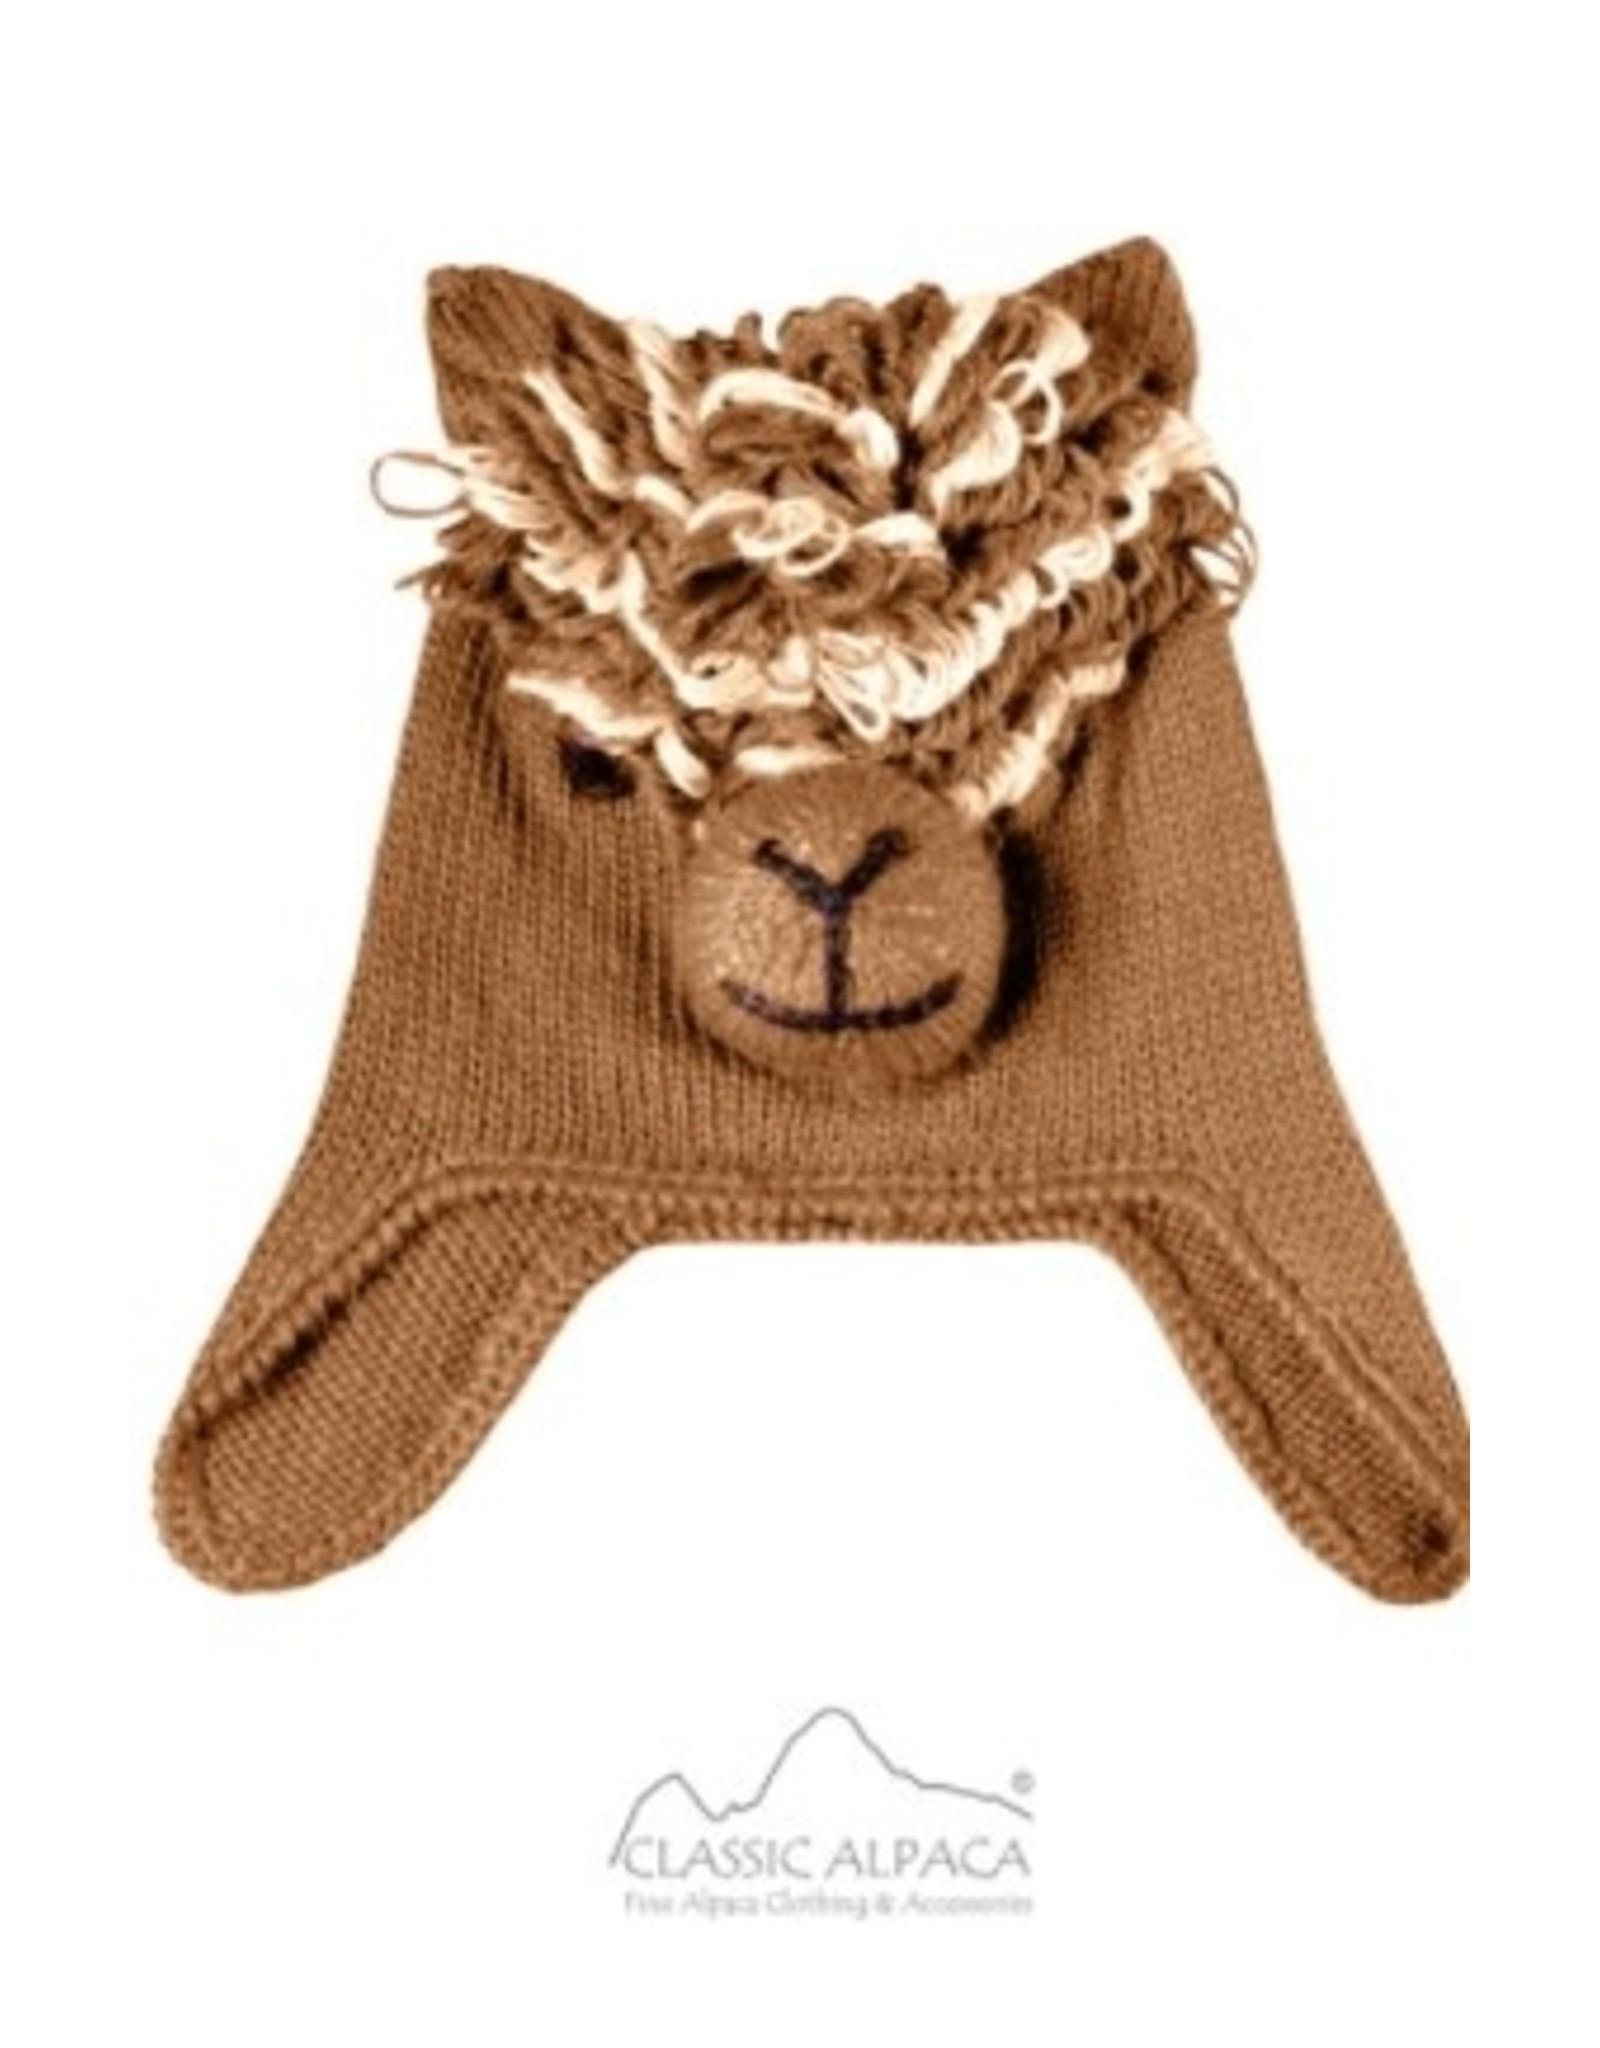 Alpaca Kids - Alpaca Hats with Ear Flaps